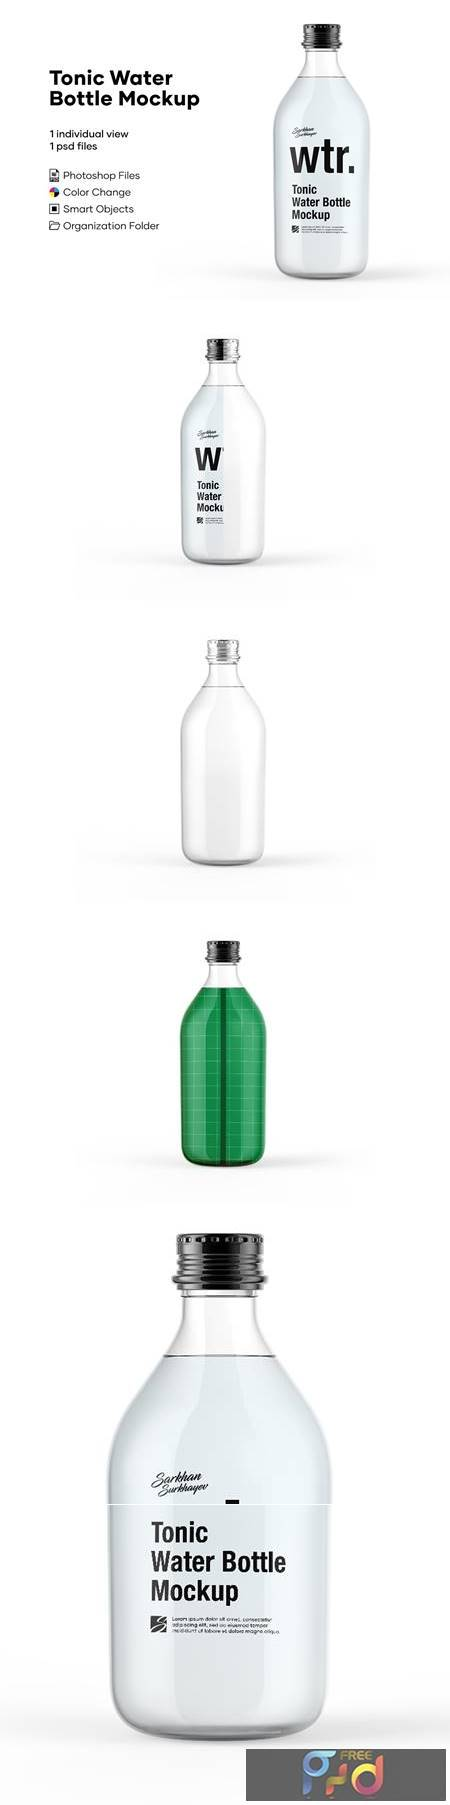 Tonic Bottle Mockup 5276734 1